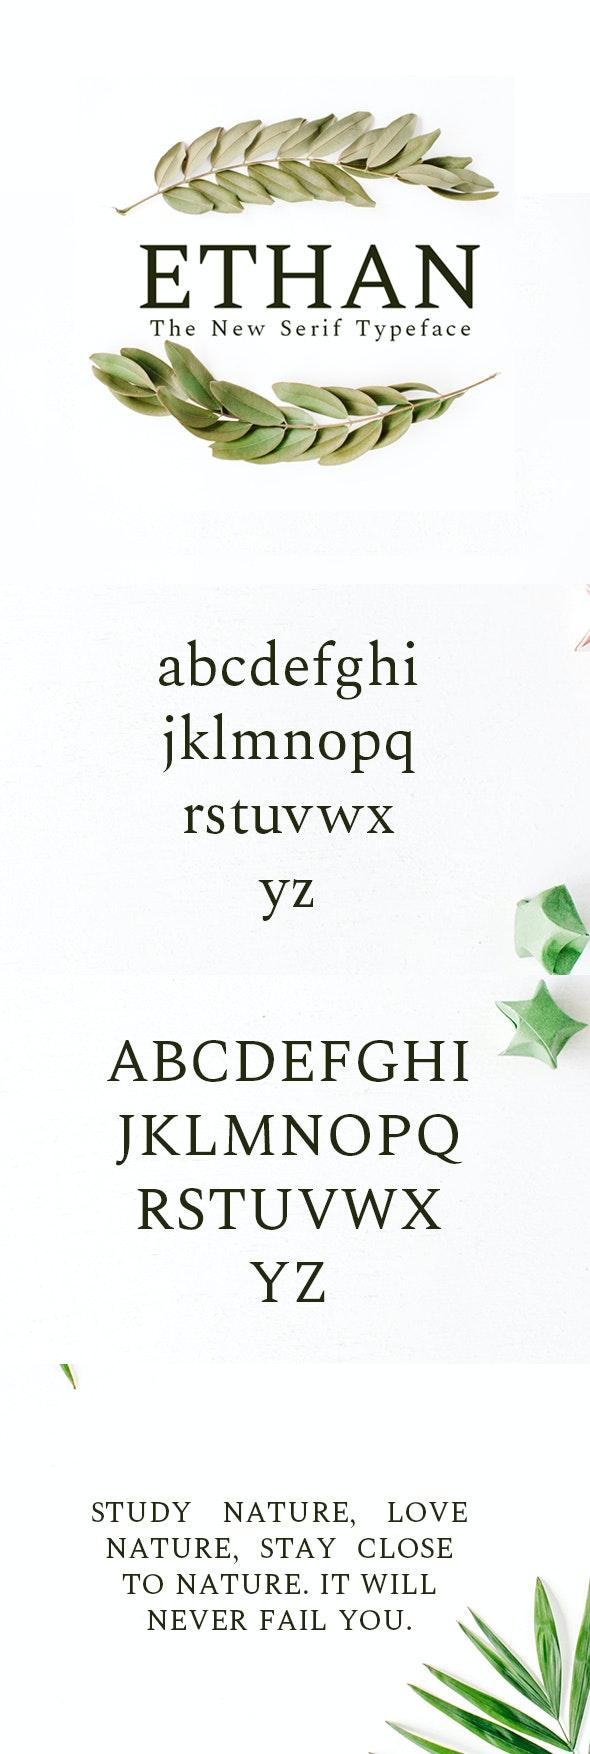 Ethan Serif 8 Font Family Pack - Serif Fonts